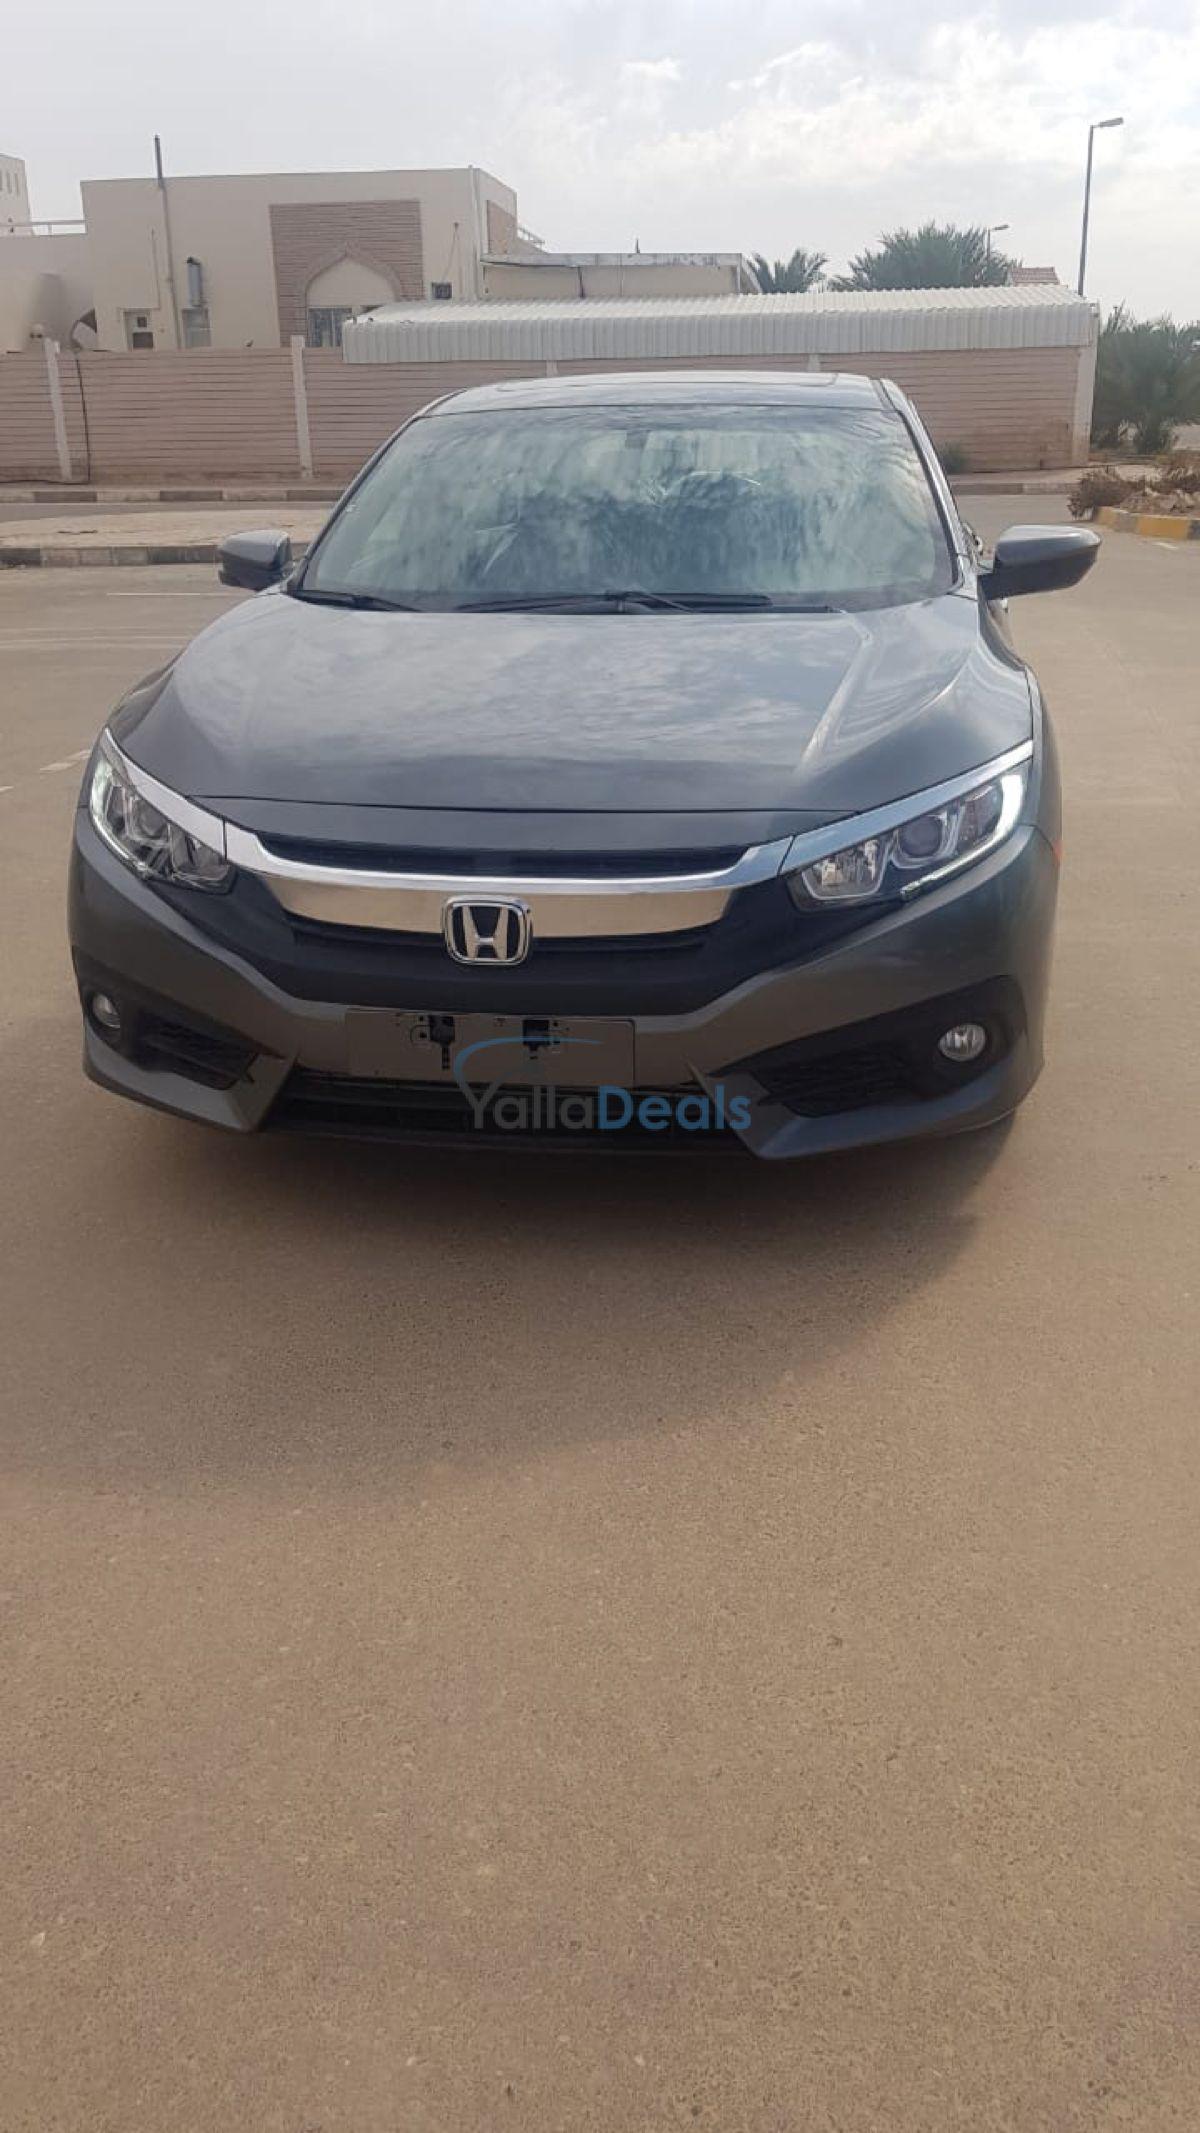 New & Used cars in UAE, Al Ain, 2017